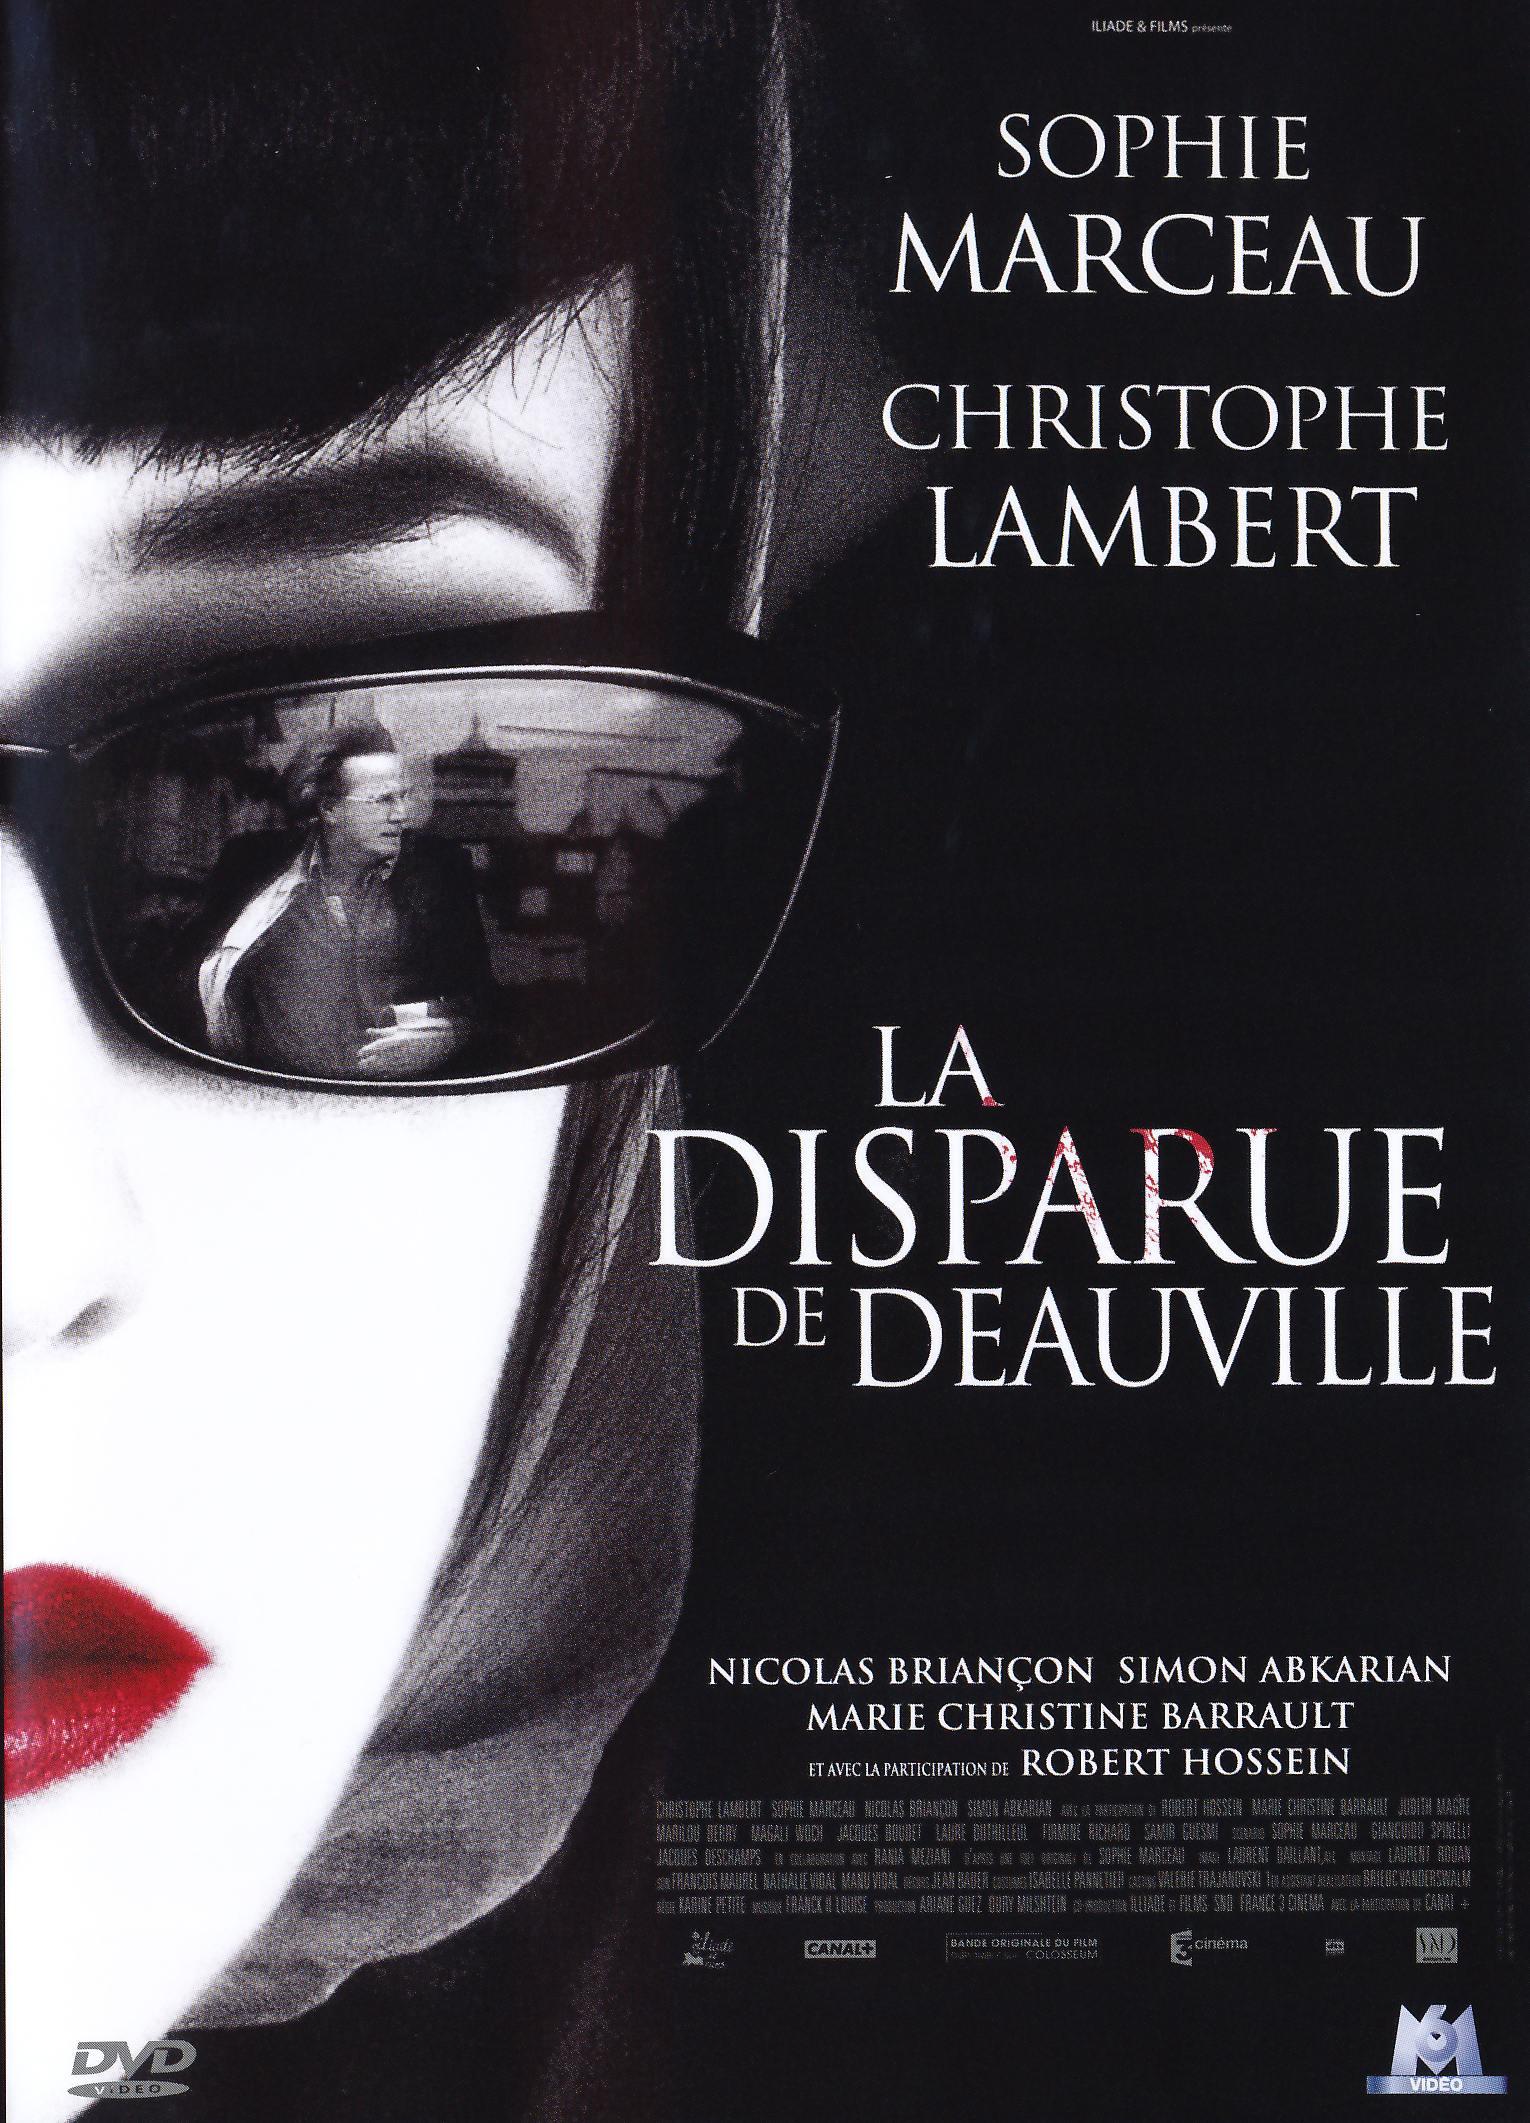 Disparue de deauville - dvd